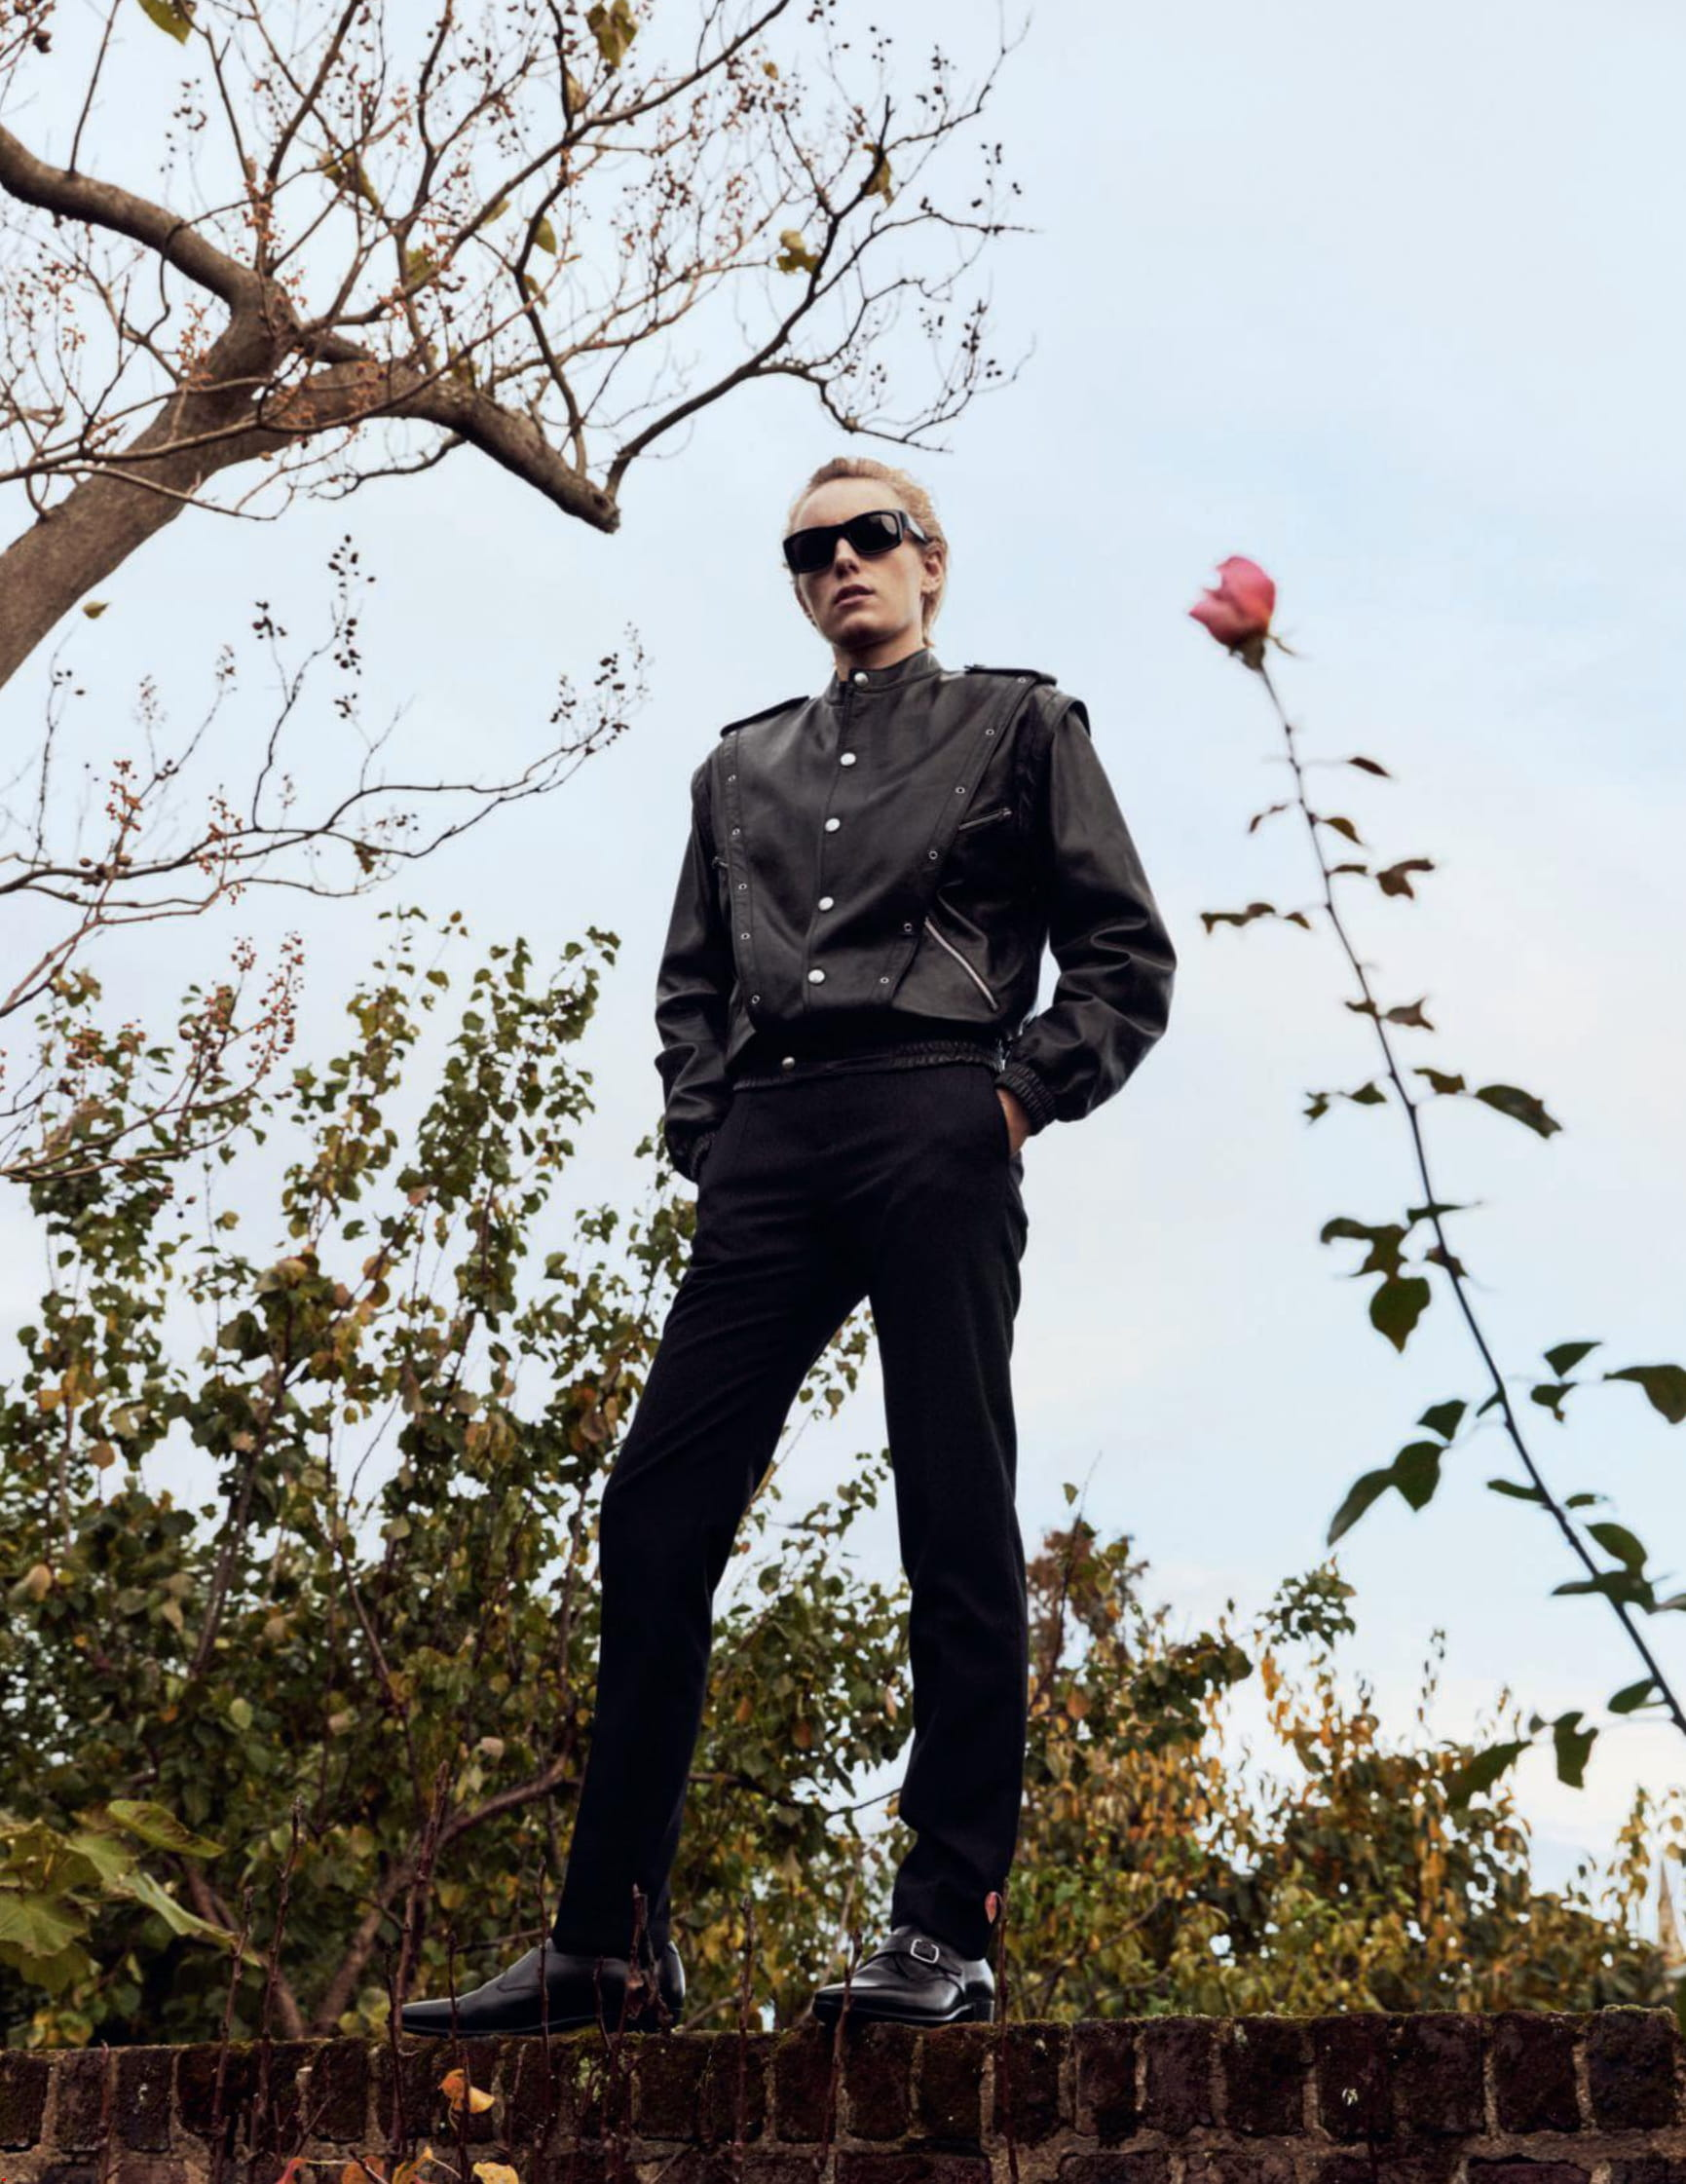 Erika Linder by Mikael Jansson for Vogue Paris Feb 2019 (2).jpg